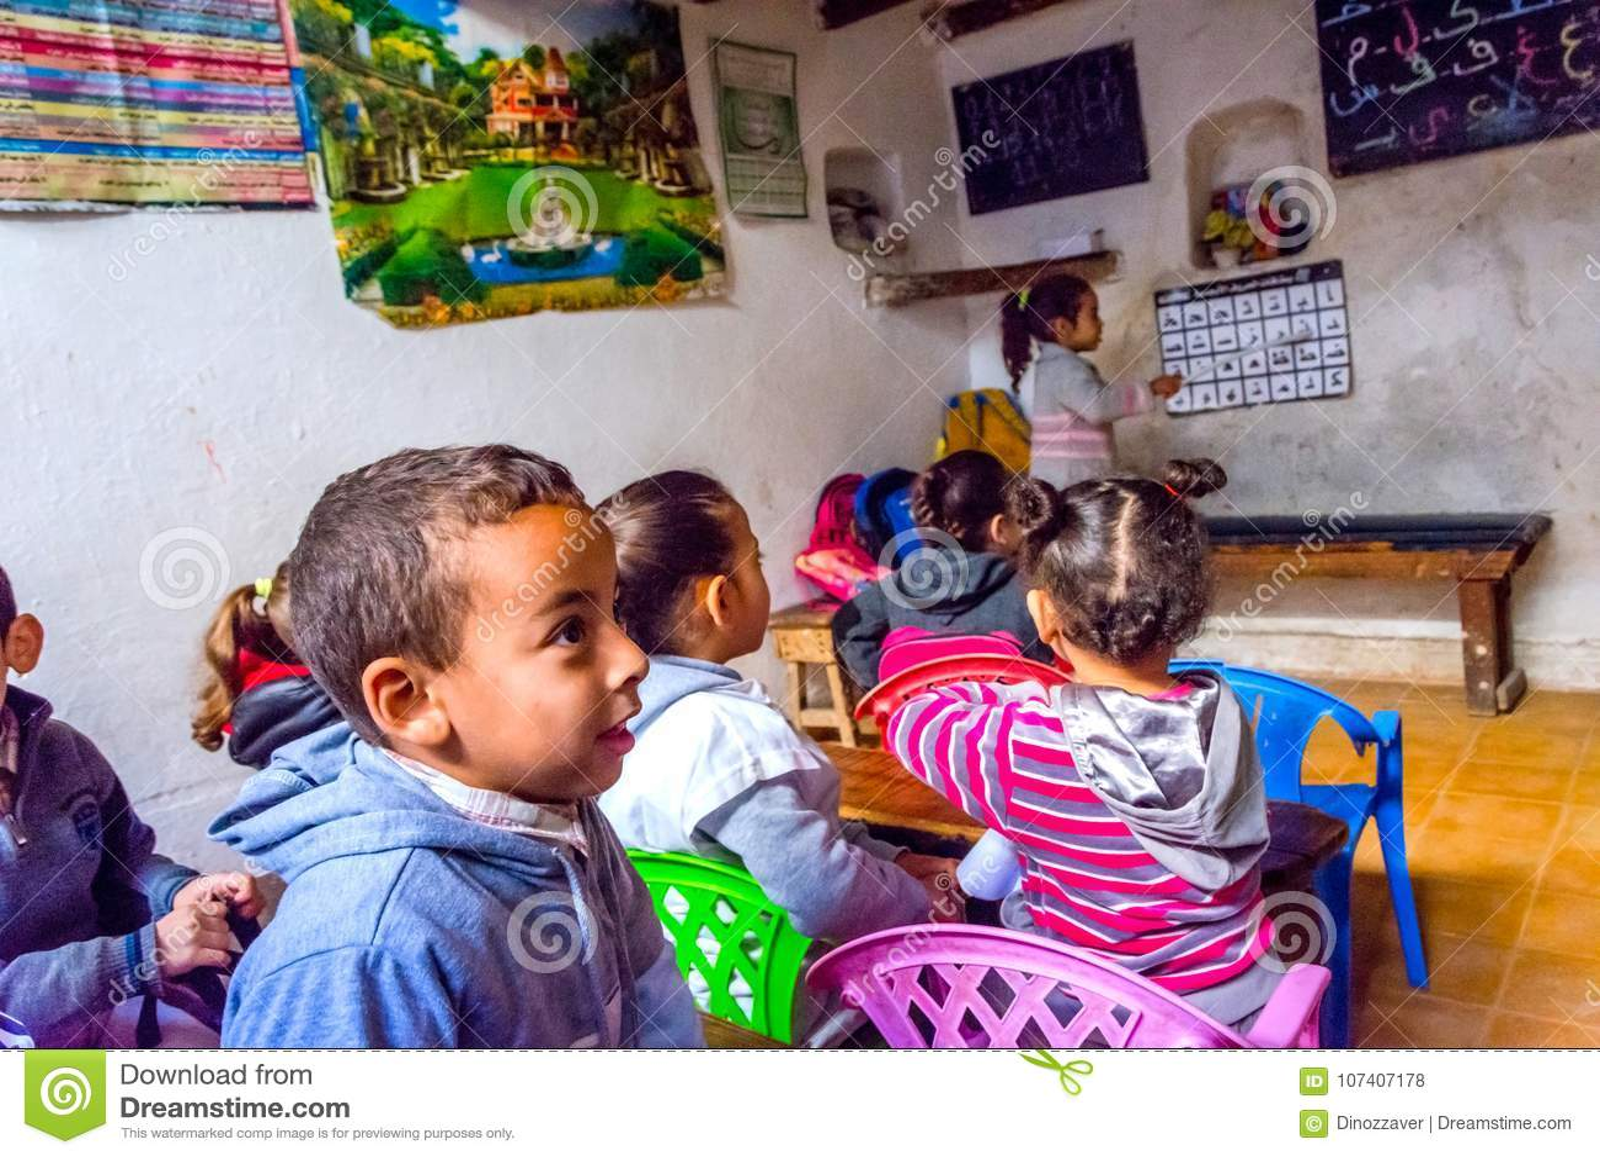 Children At School Classroom Stock Image - Image of